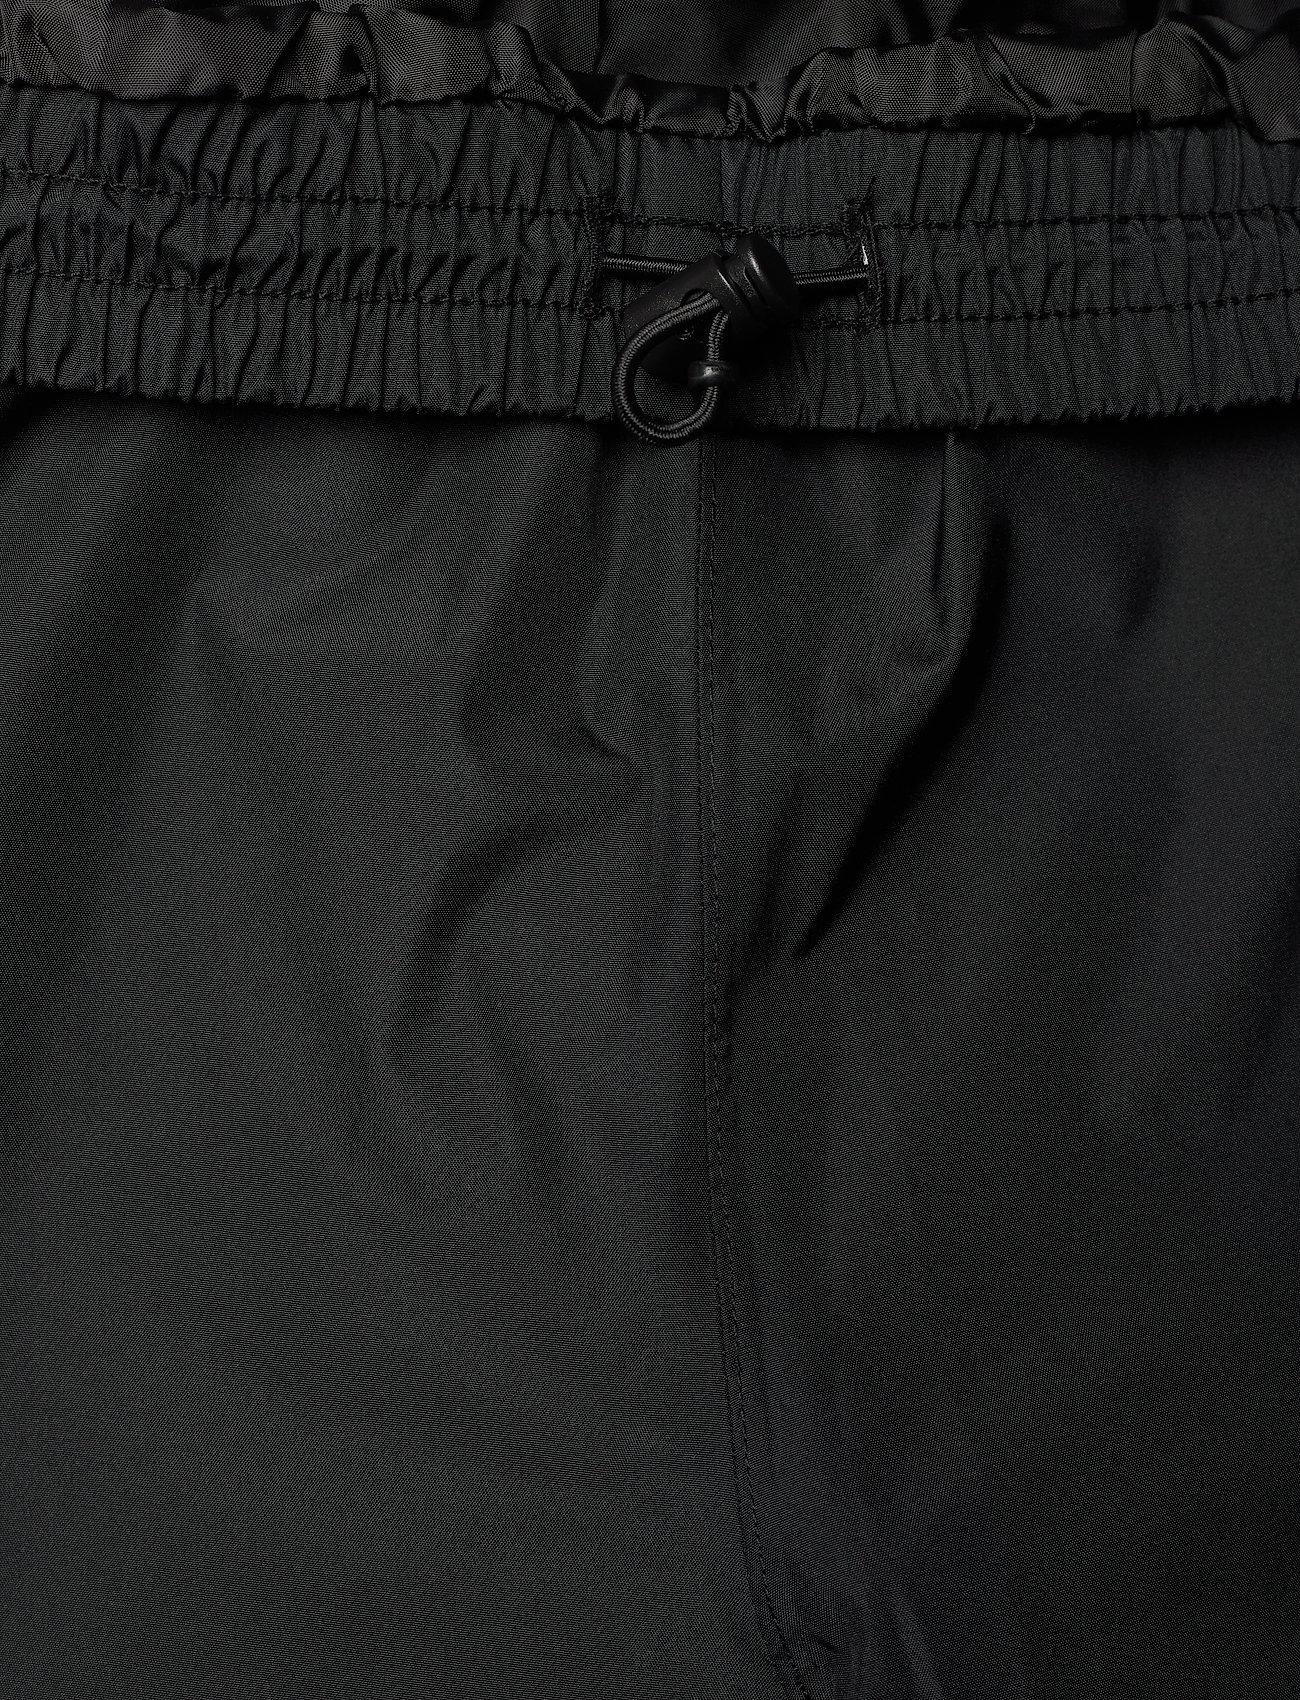 Weather Report - Jagger M AWG Rain Set W-PRO 10000 - pantalon déperlant - black - 8